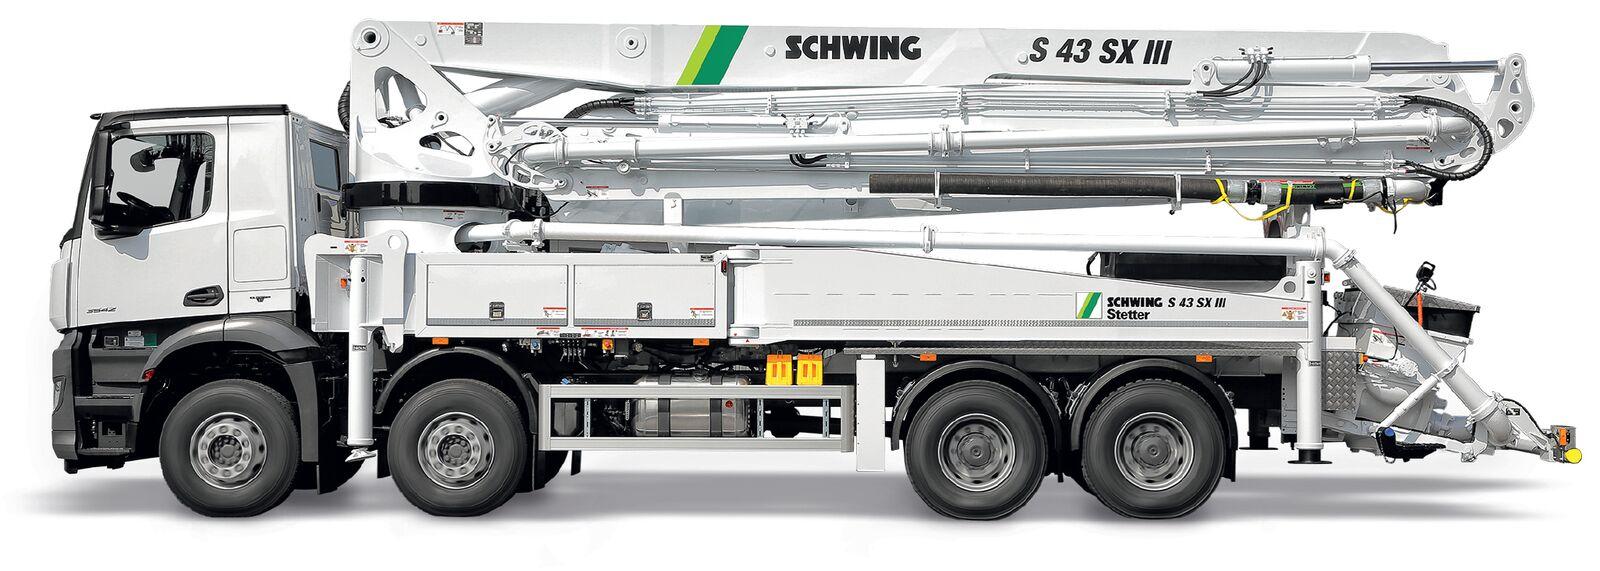 Schwing Australia Pty Ltd - Concrete Pumps & Equipment - Green Point